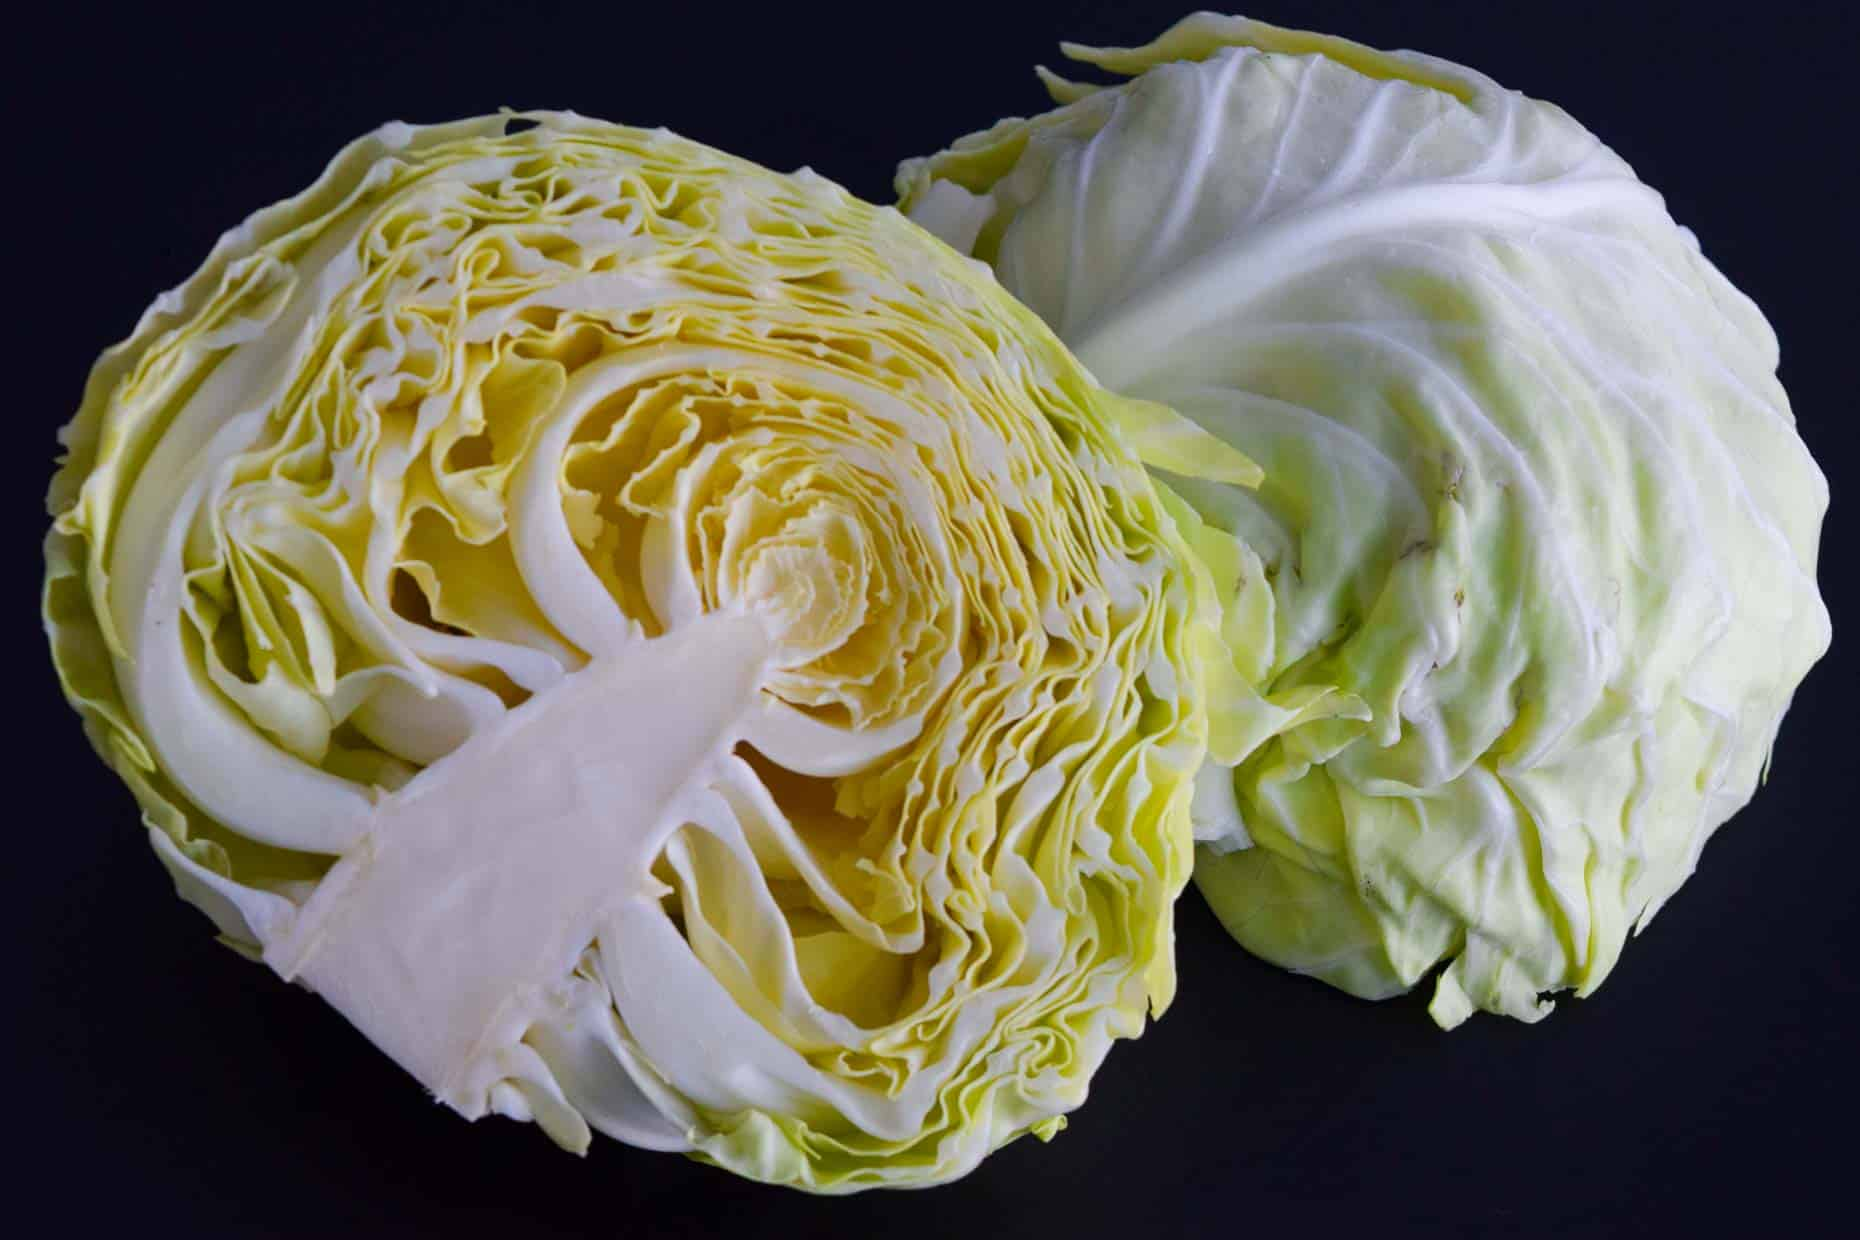 Cabbage on black background